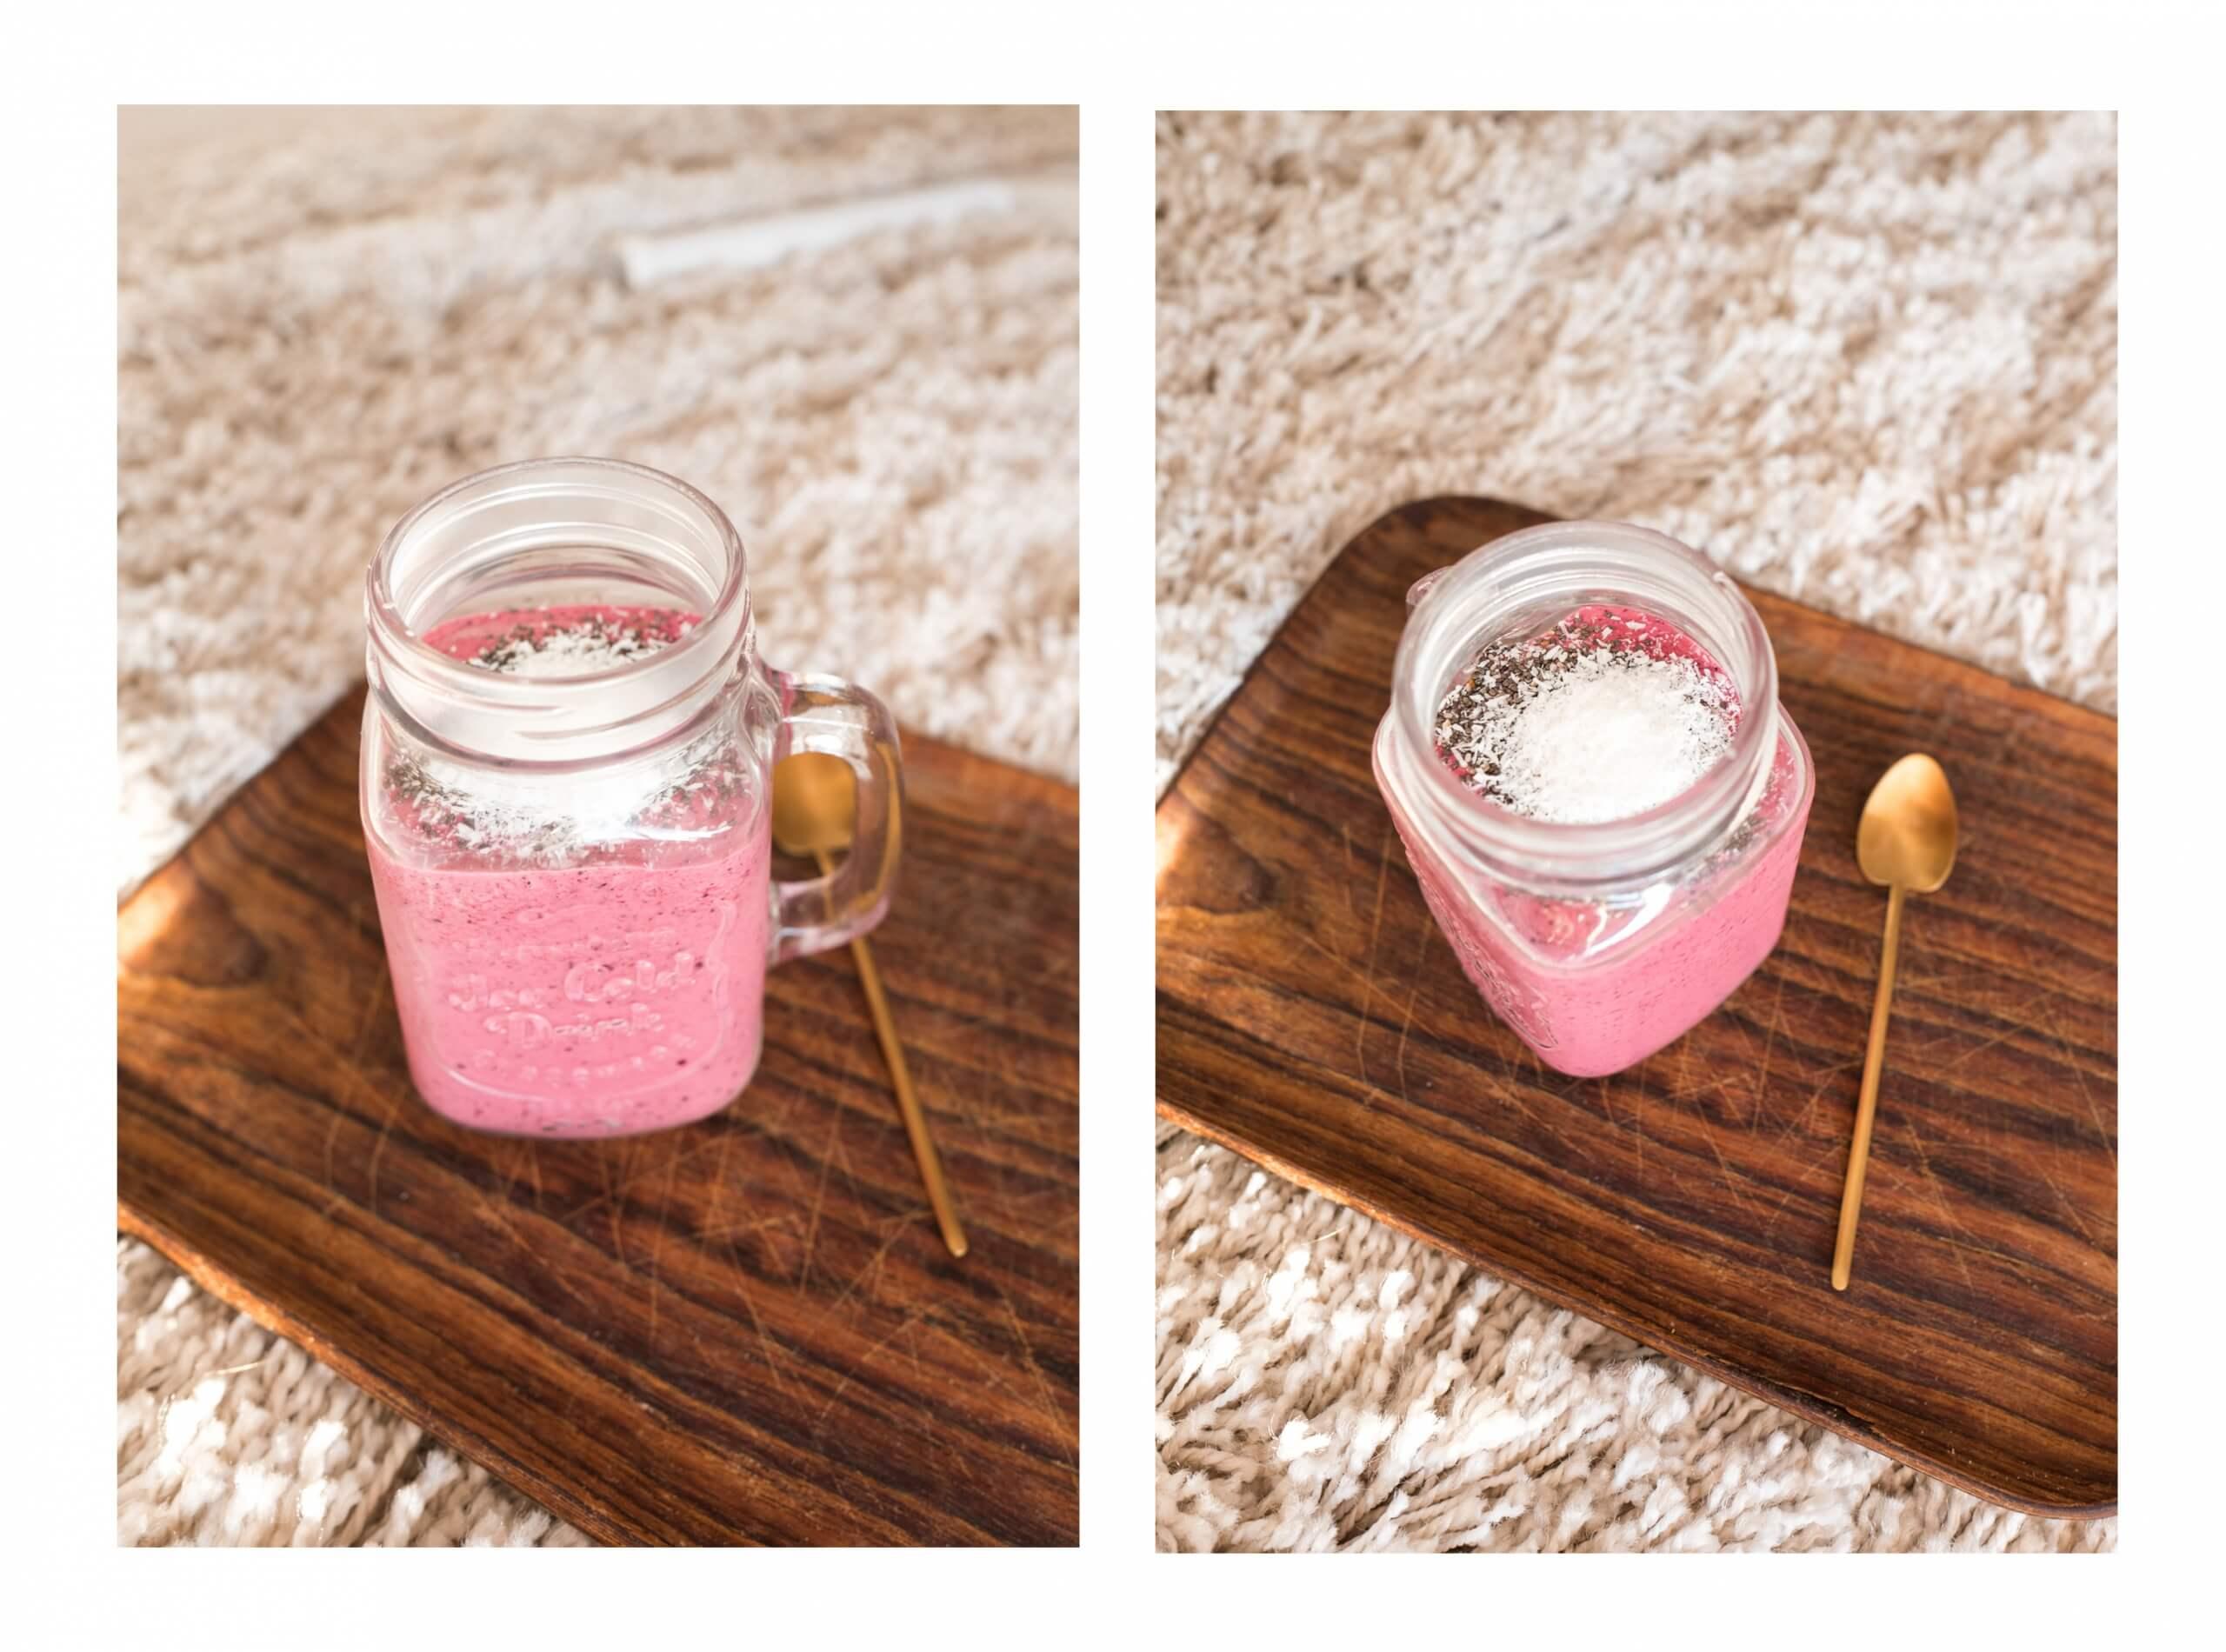 janni-deler-smoothie-jar